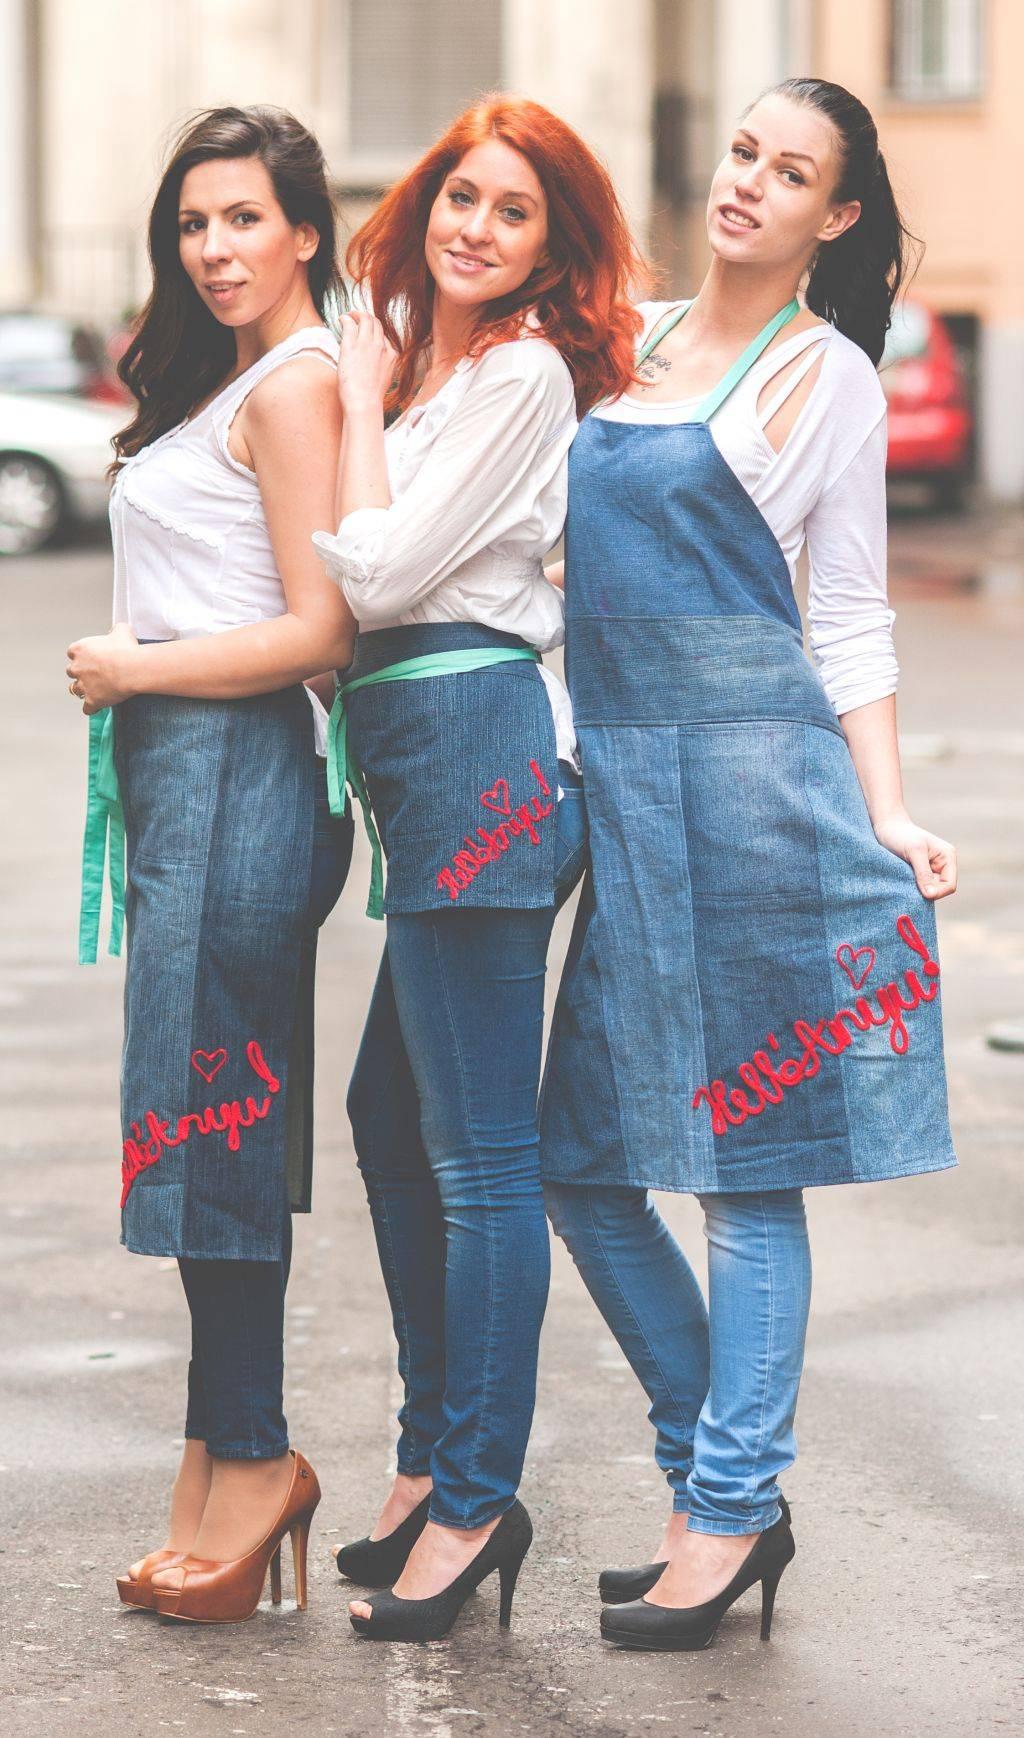 koteny - Ajánlataink - Rethy Fashion